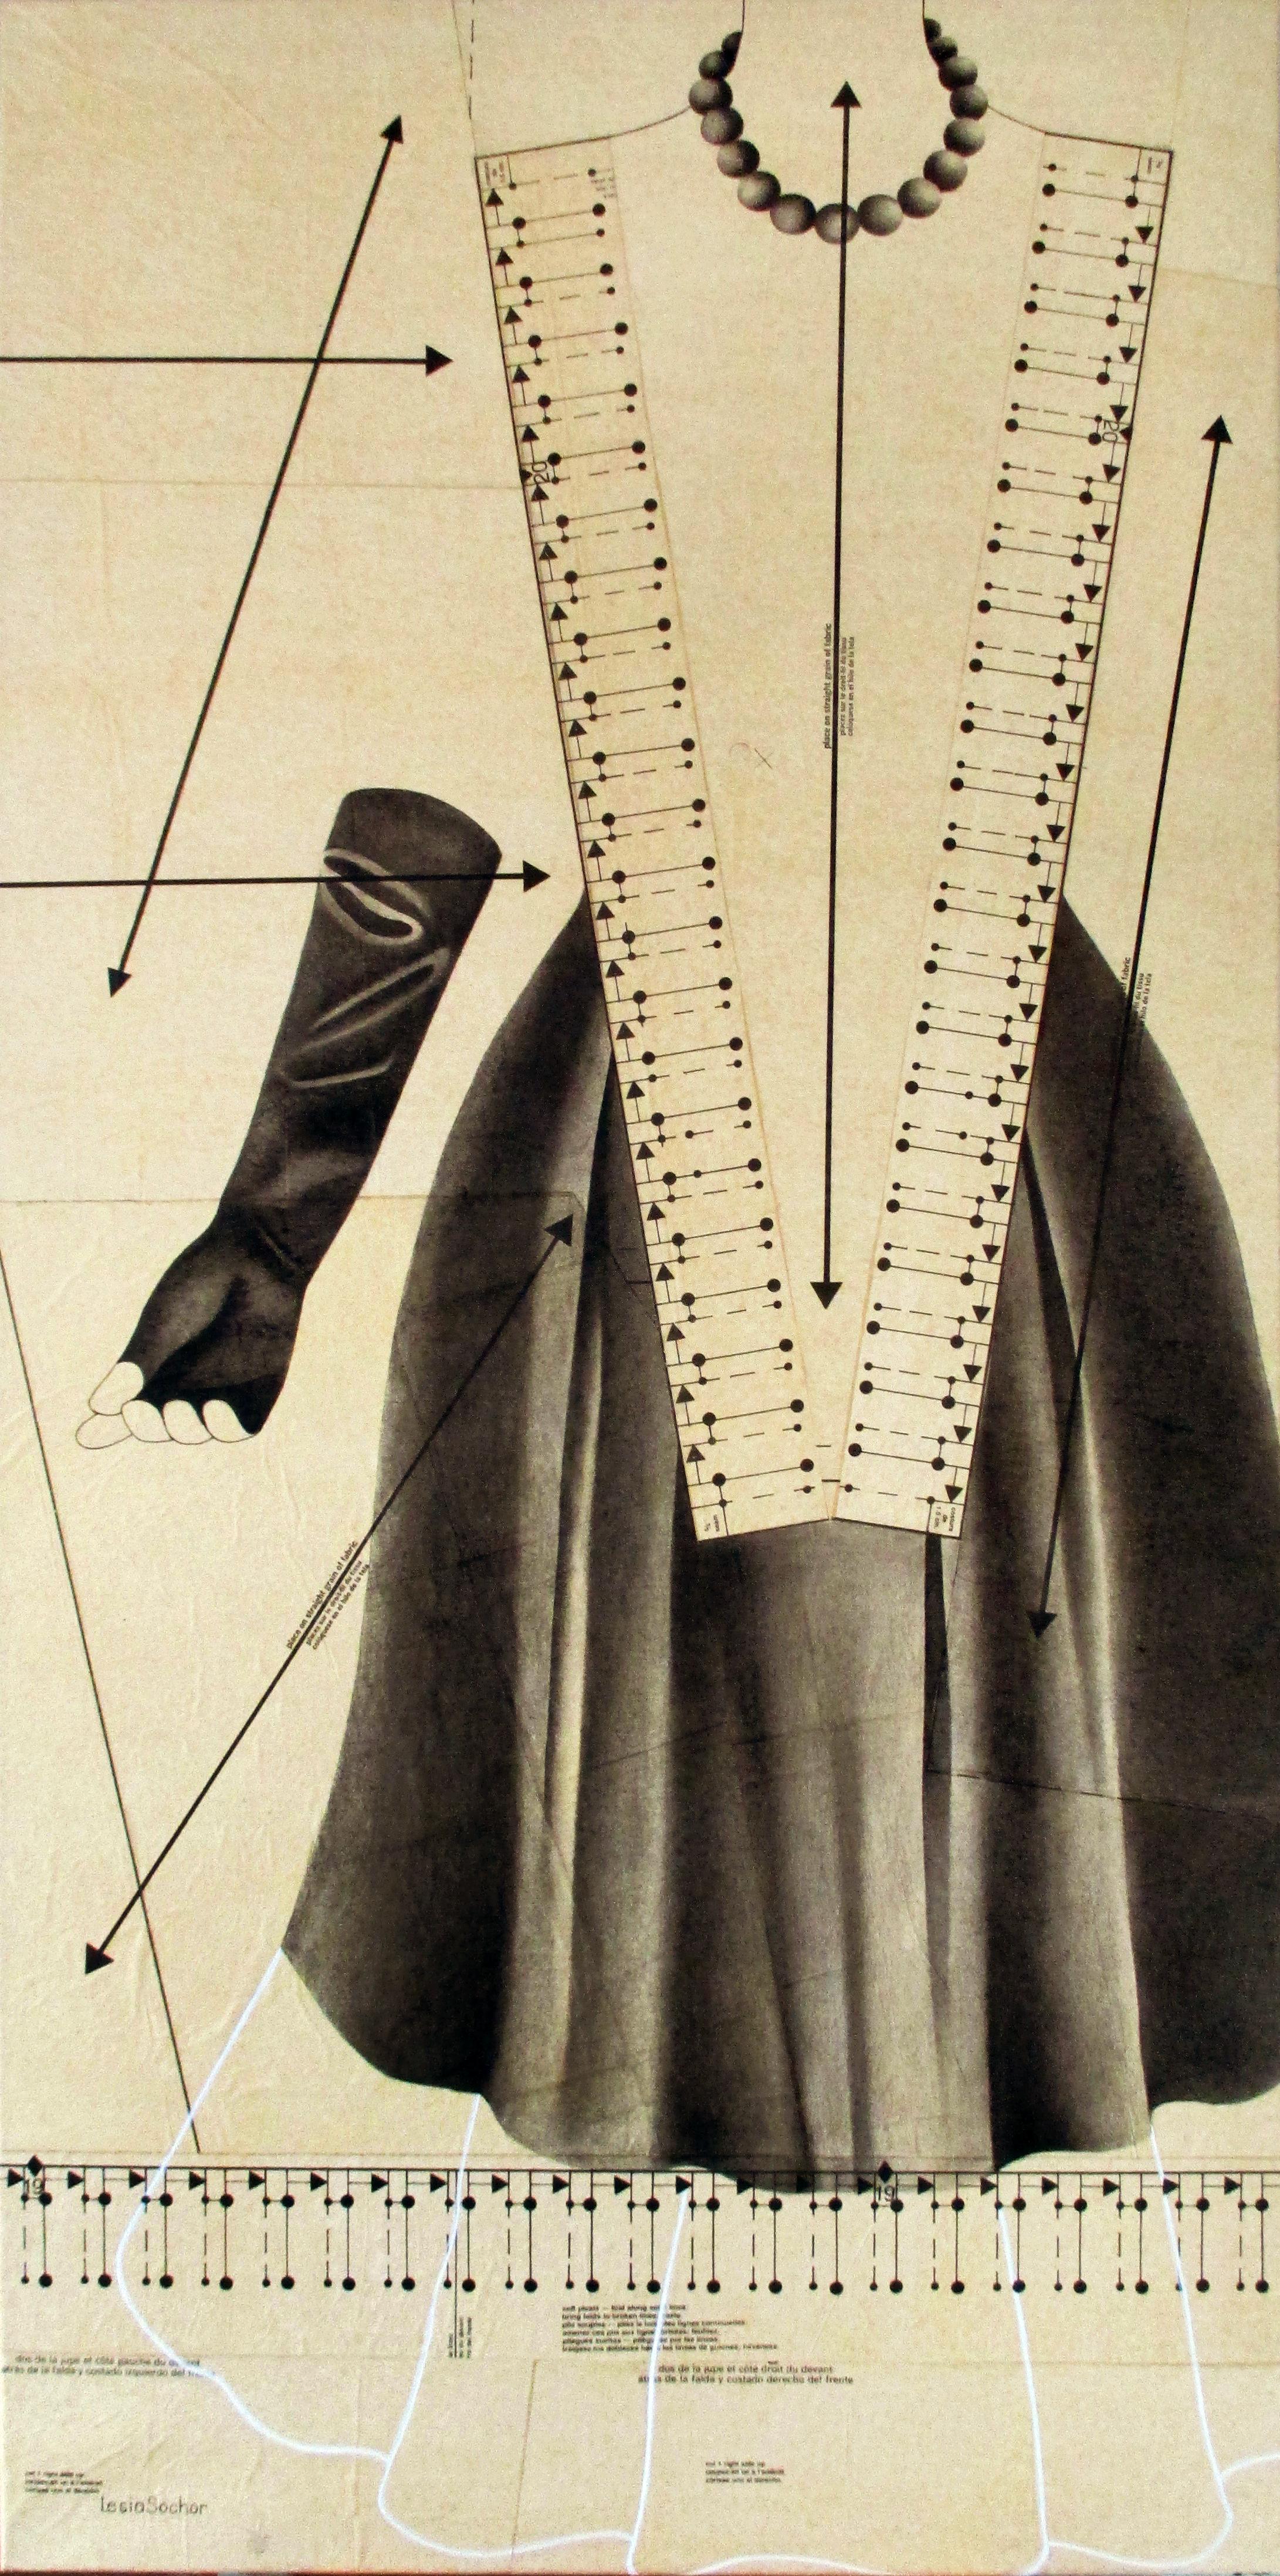 Sochor Lesia 'FRIDA'  oil on collaged sewing pattern paper 24x48  2015.jpg